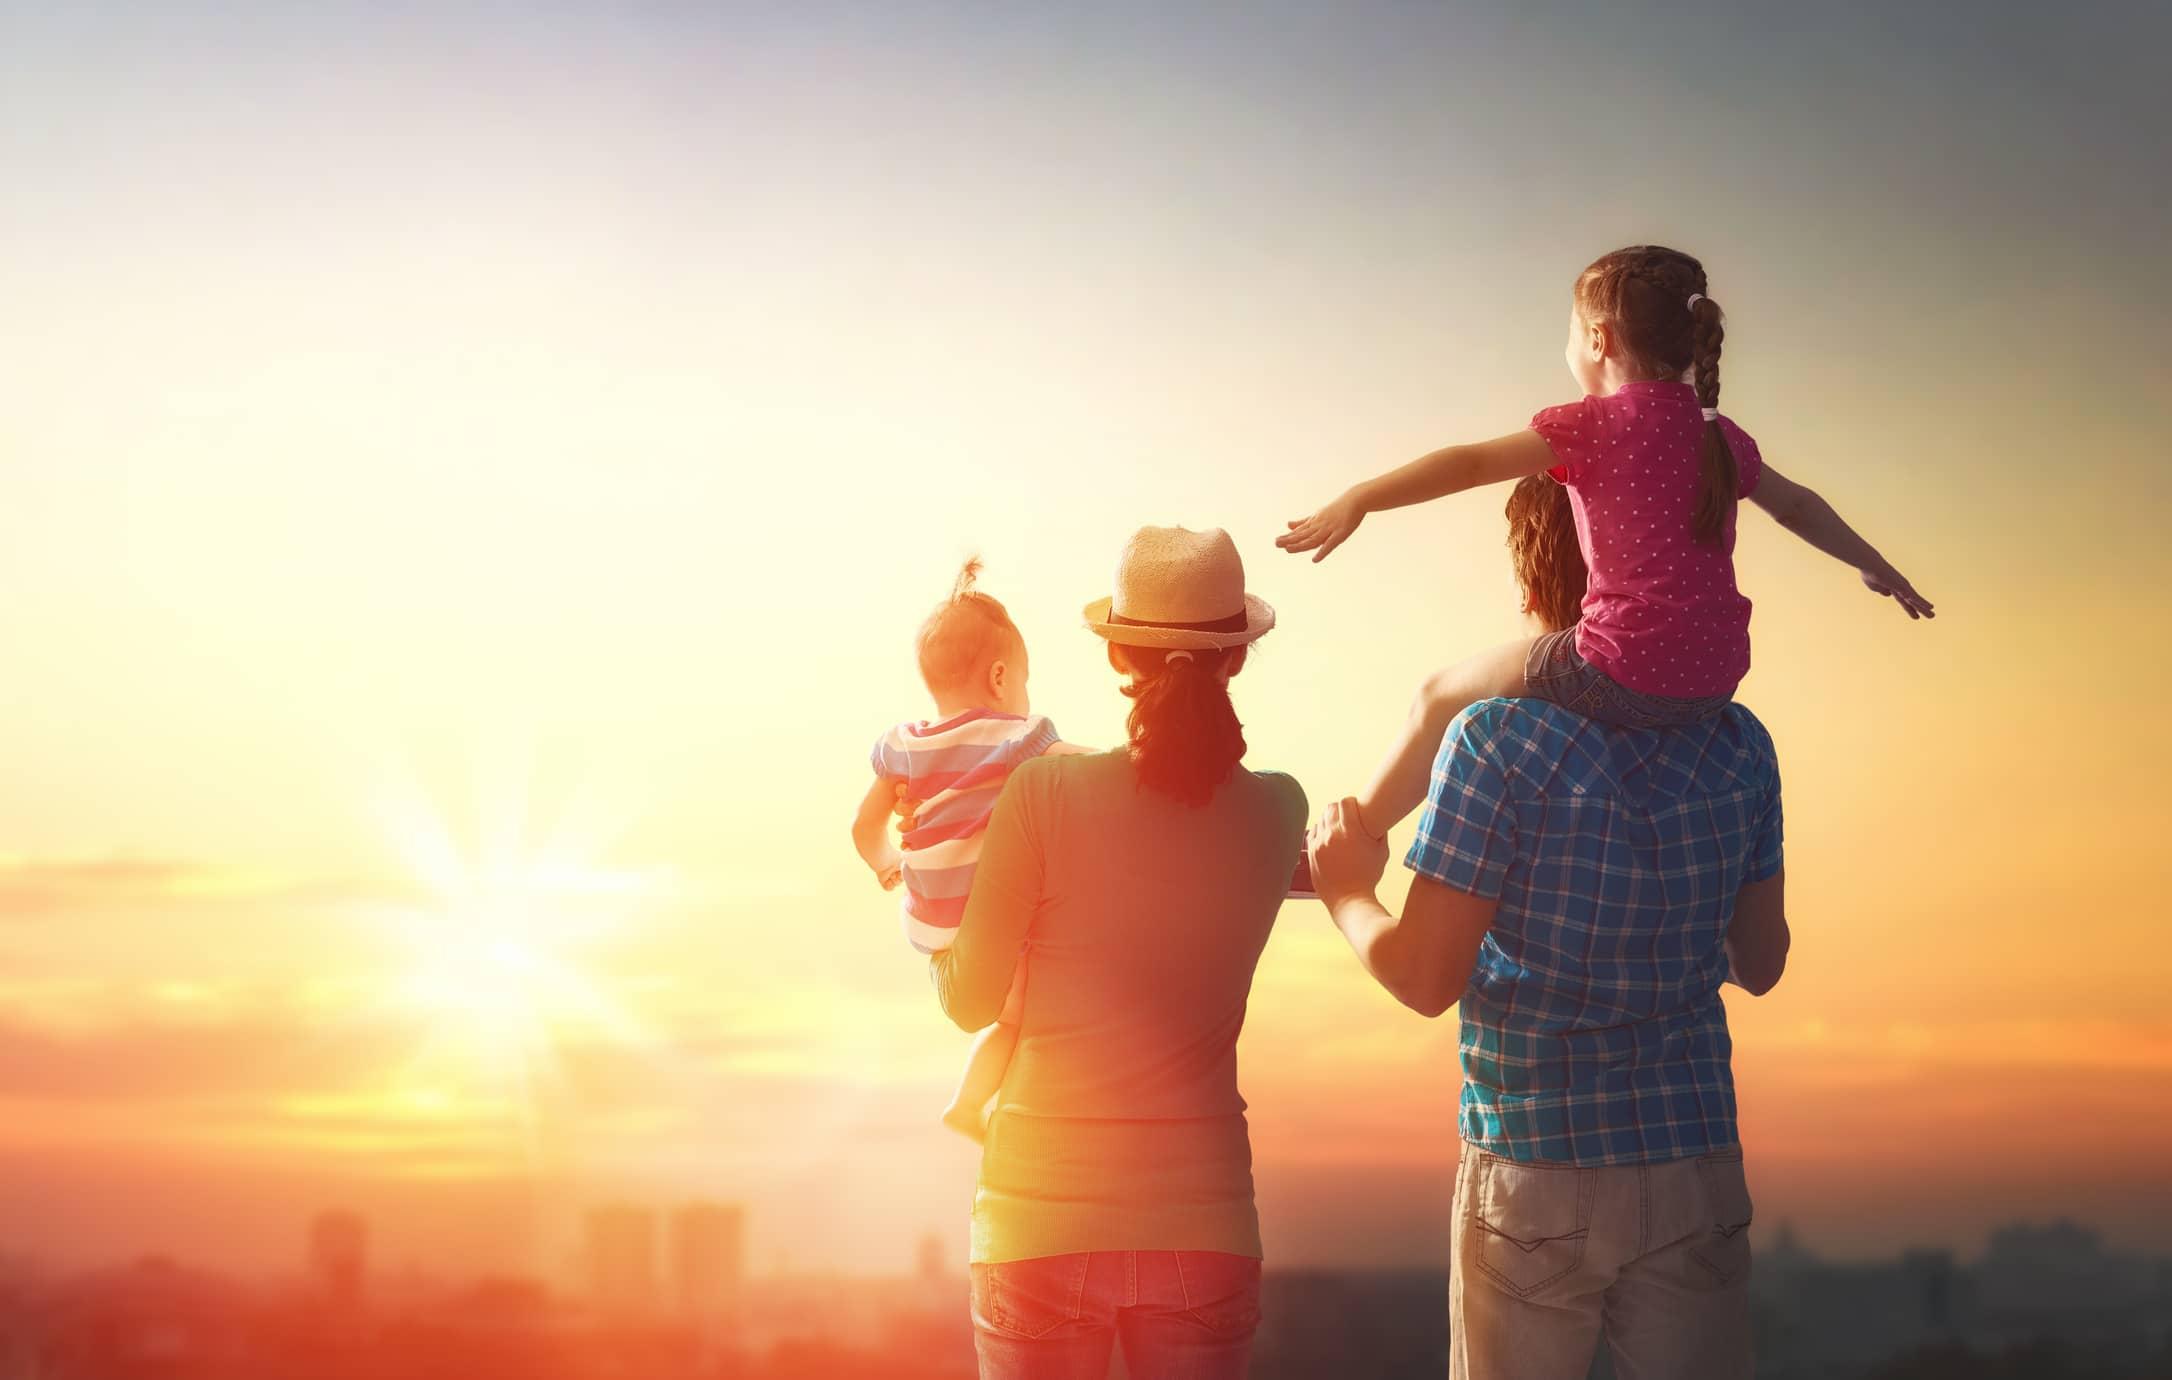 Miami Psychology Group Child Psychology helping children be happy